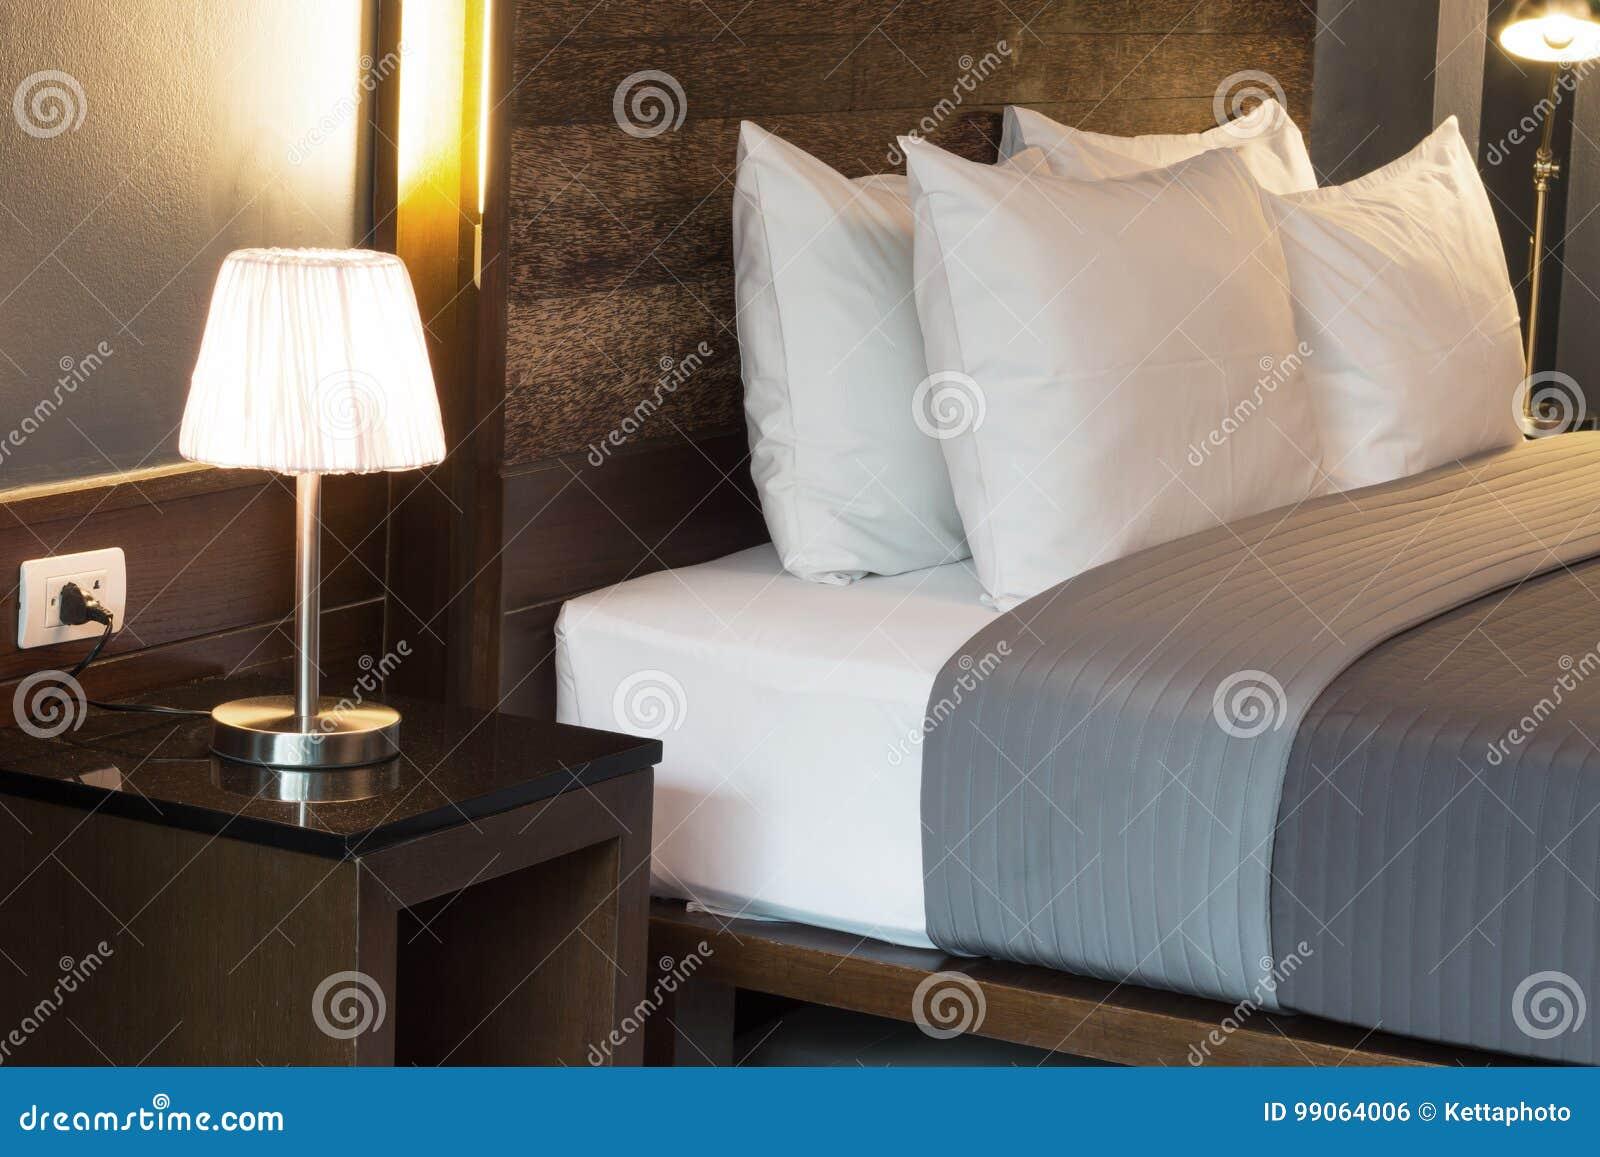 Dark color bedroom stock photo. Image of cotton, lamp - 99064006